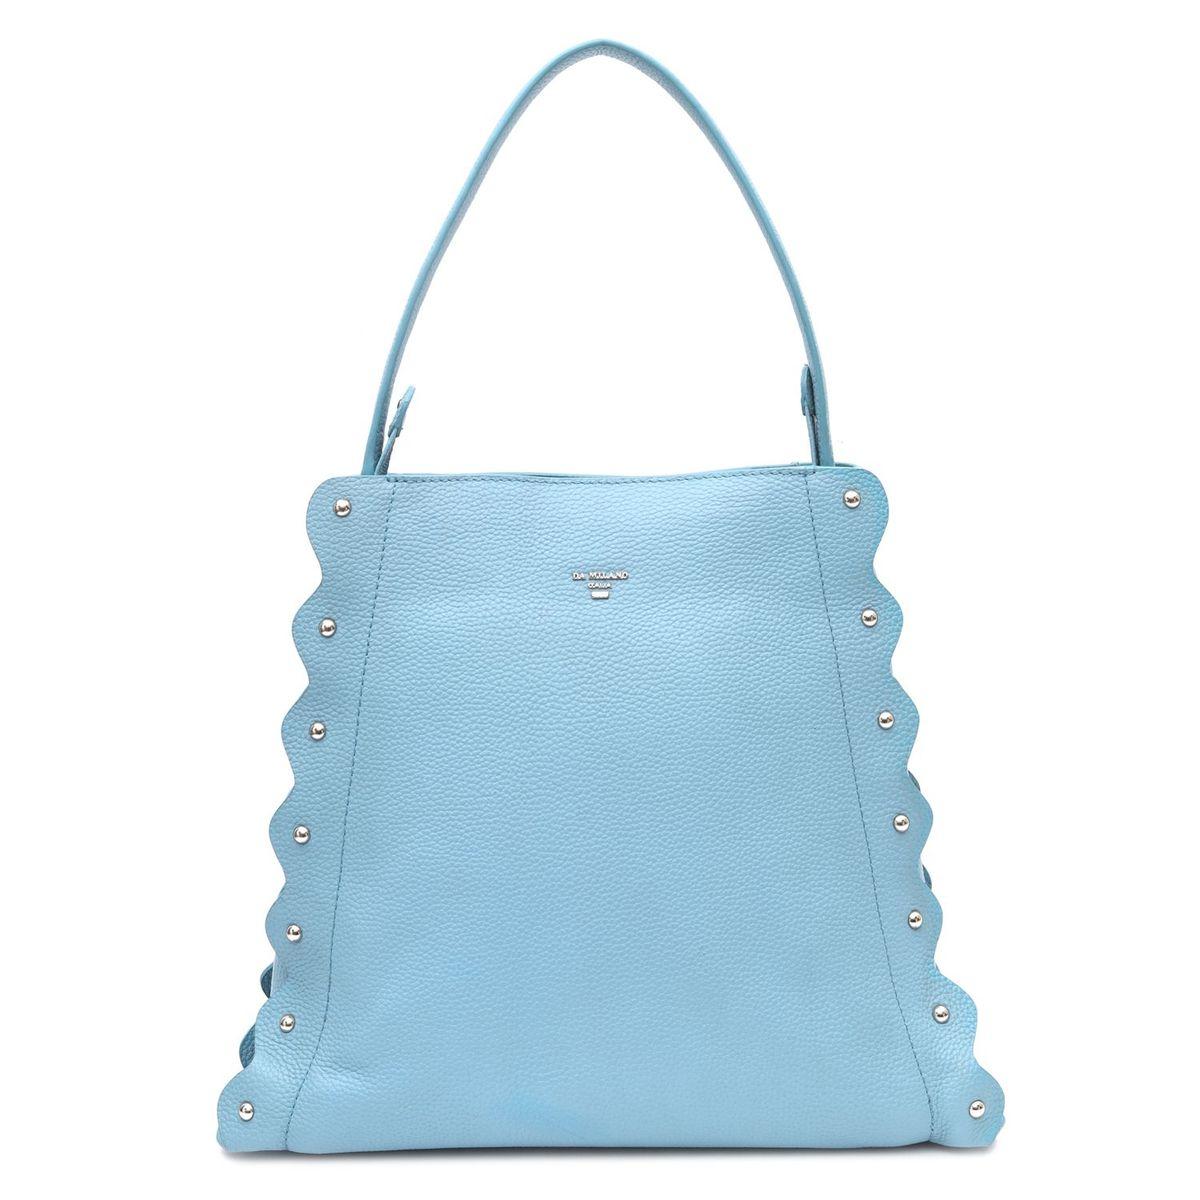 95ef1e6069691 ... Da Milano Blue Tote Bag · zoom ...